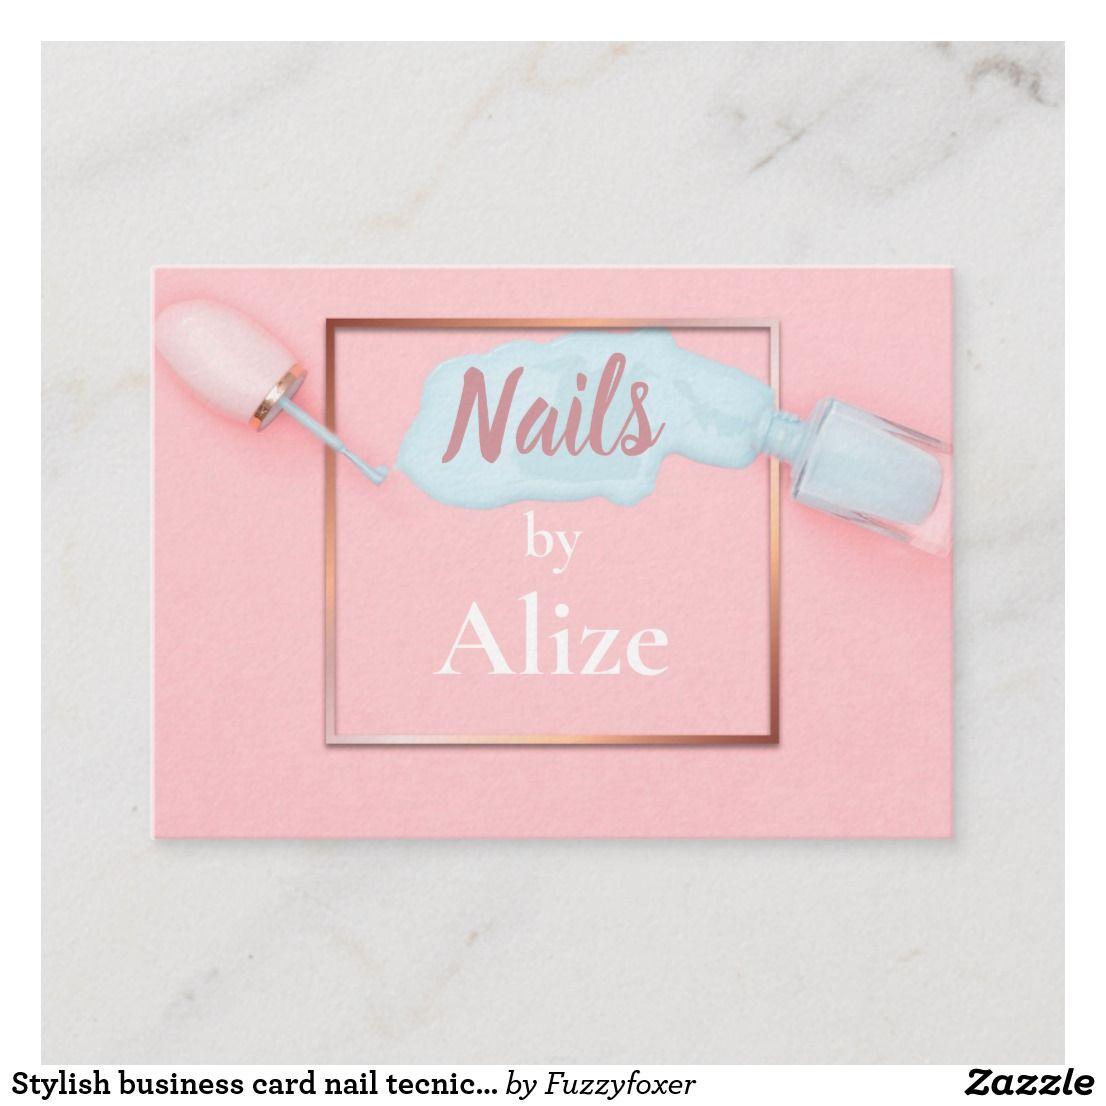 Stylish business card nail tecnician, beauty salon ...